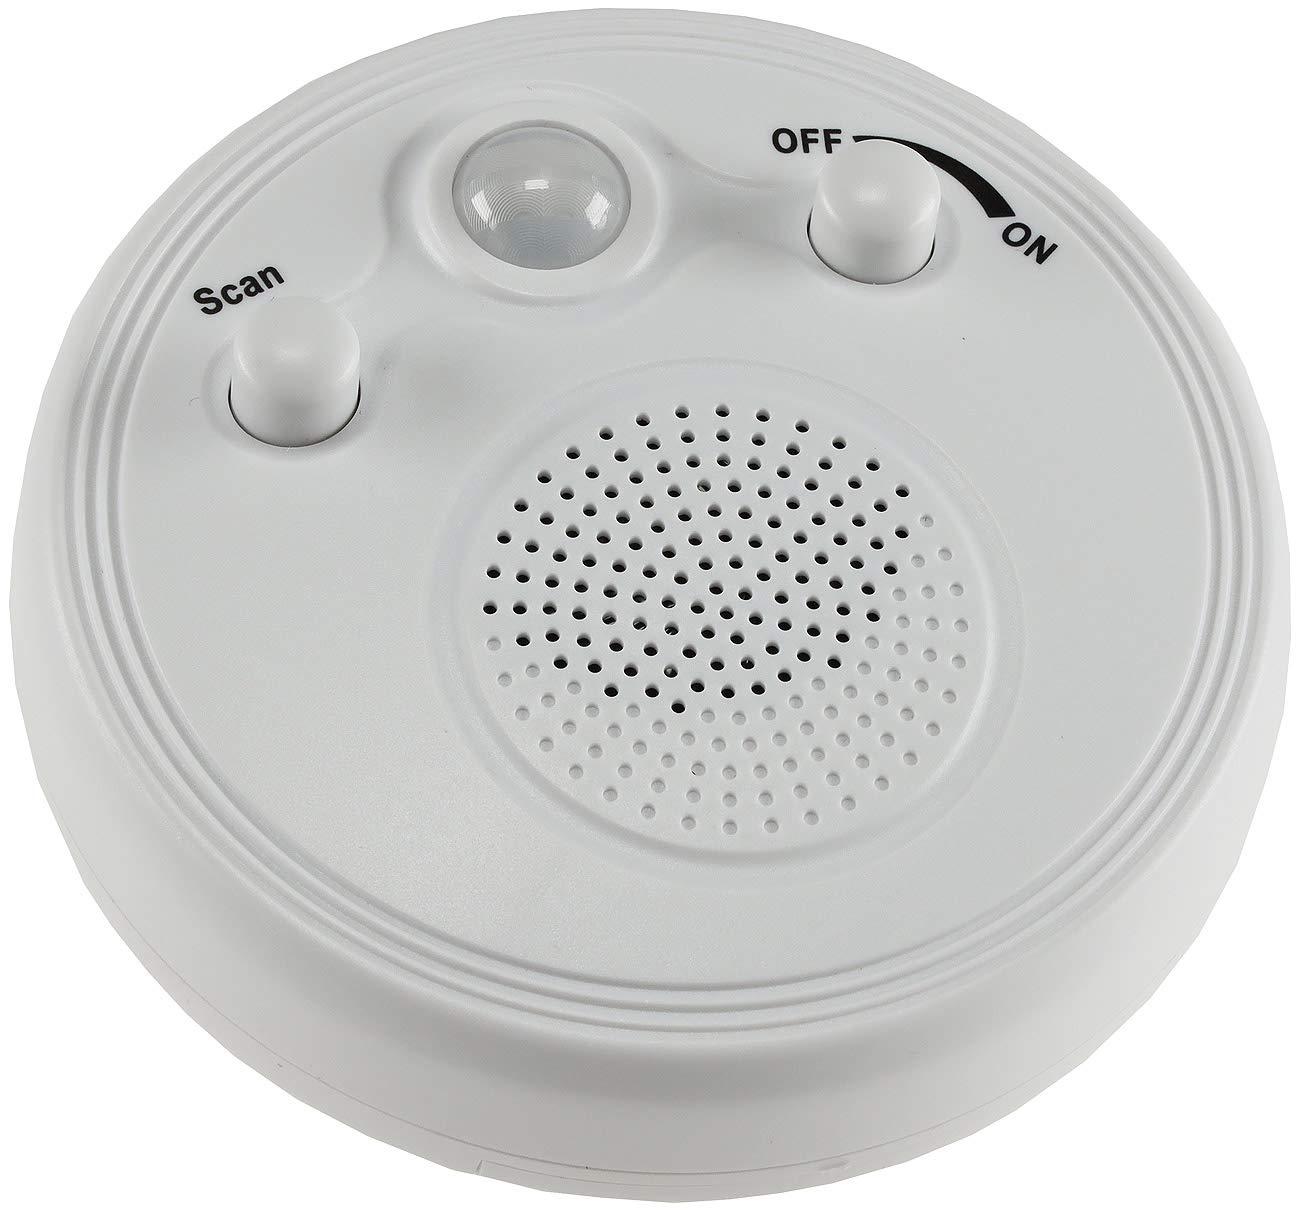 ChiliTec 21889 Wand Decken Radio mit Bewegungsmelder 360/° Sensor /Ø 95mm Batterie 3x AA Wei Wei/ß